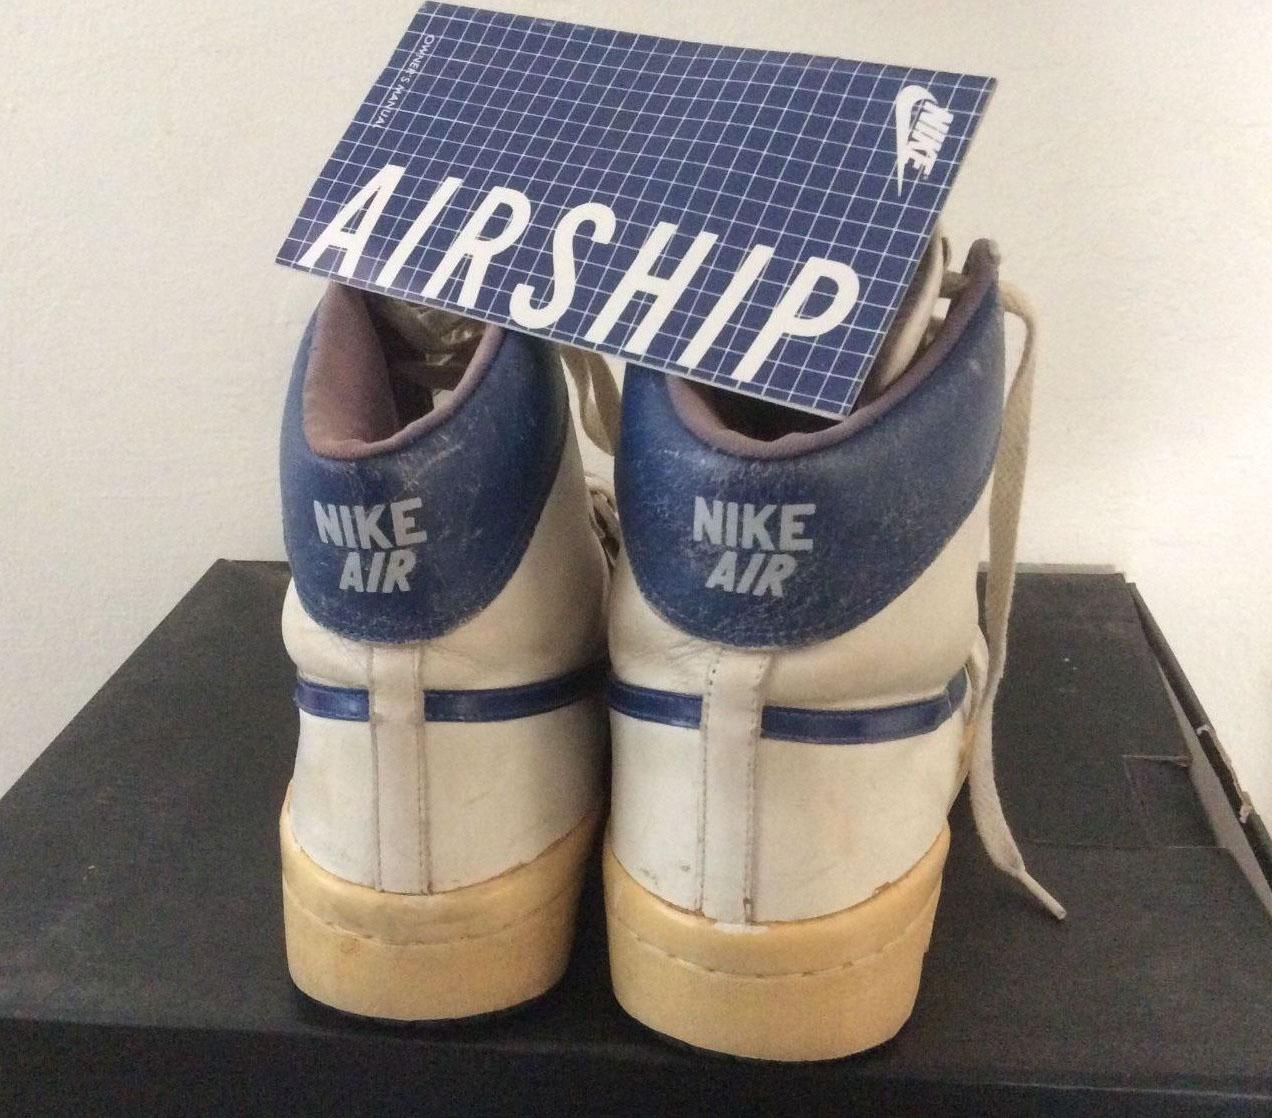 Nike Air Ship Archives - Air Jordans, Release Dates & More |  JordansDaily.com